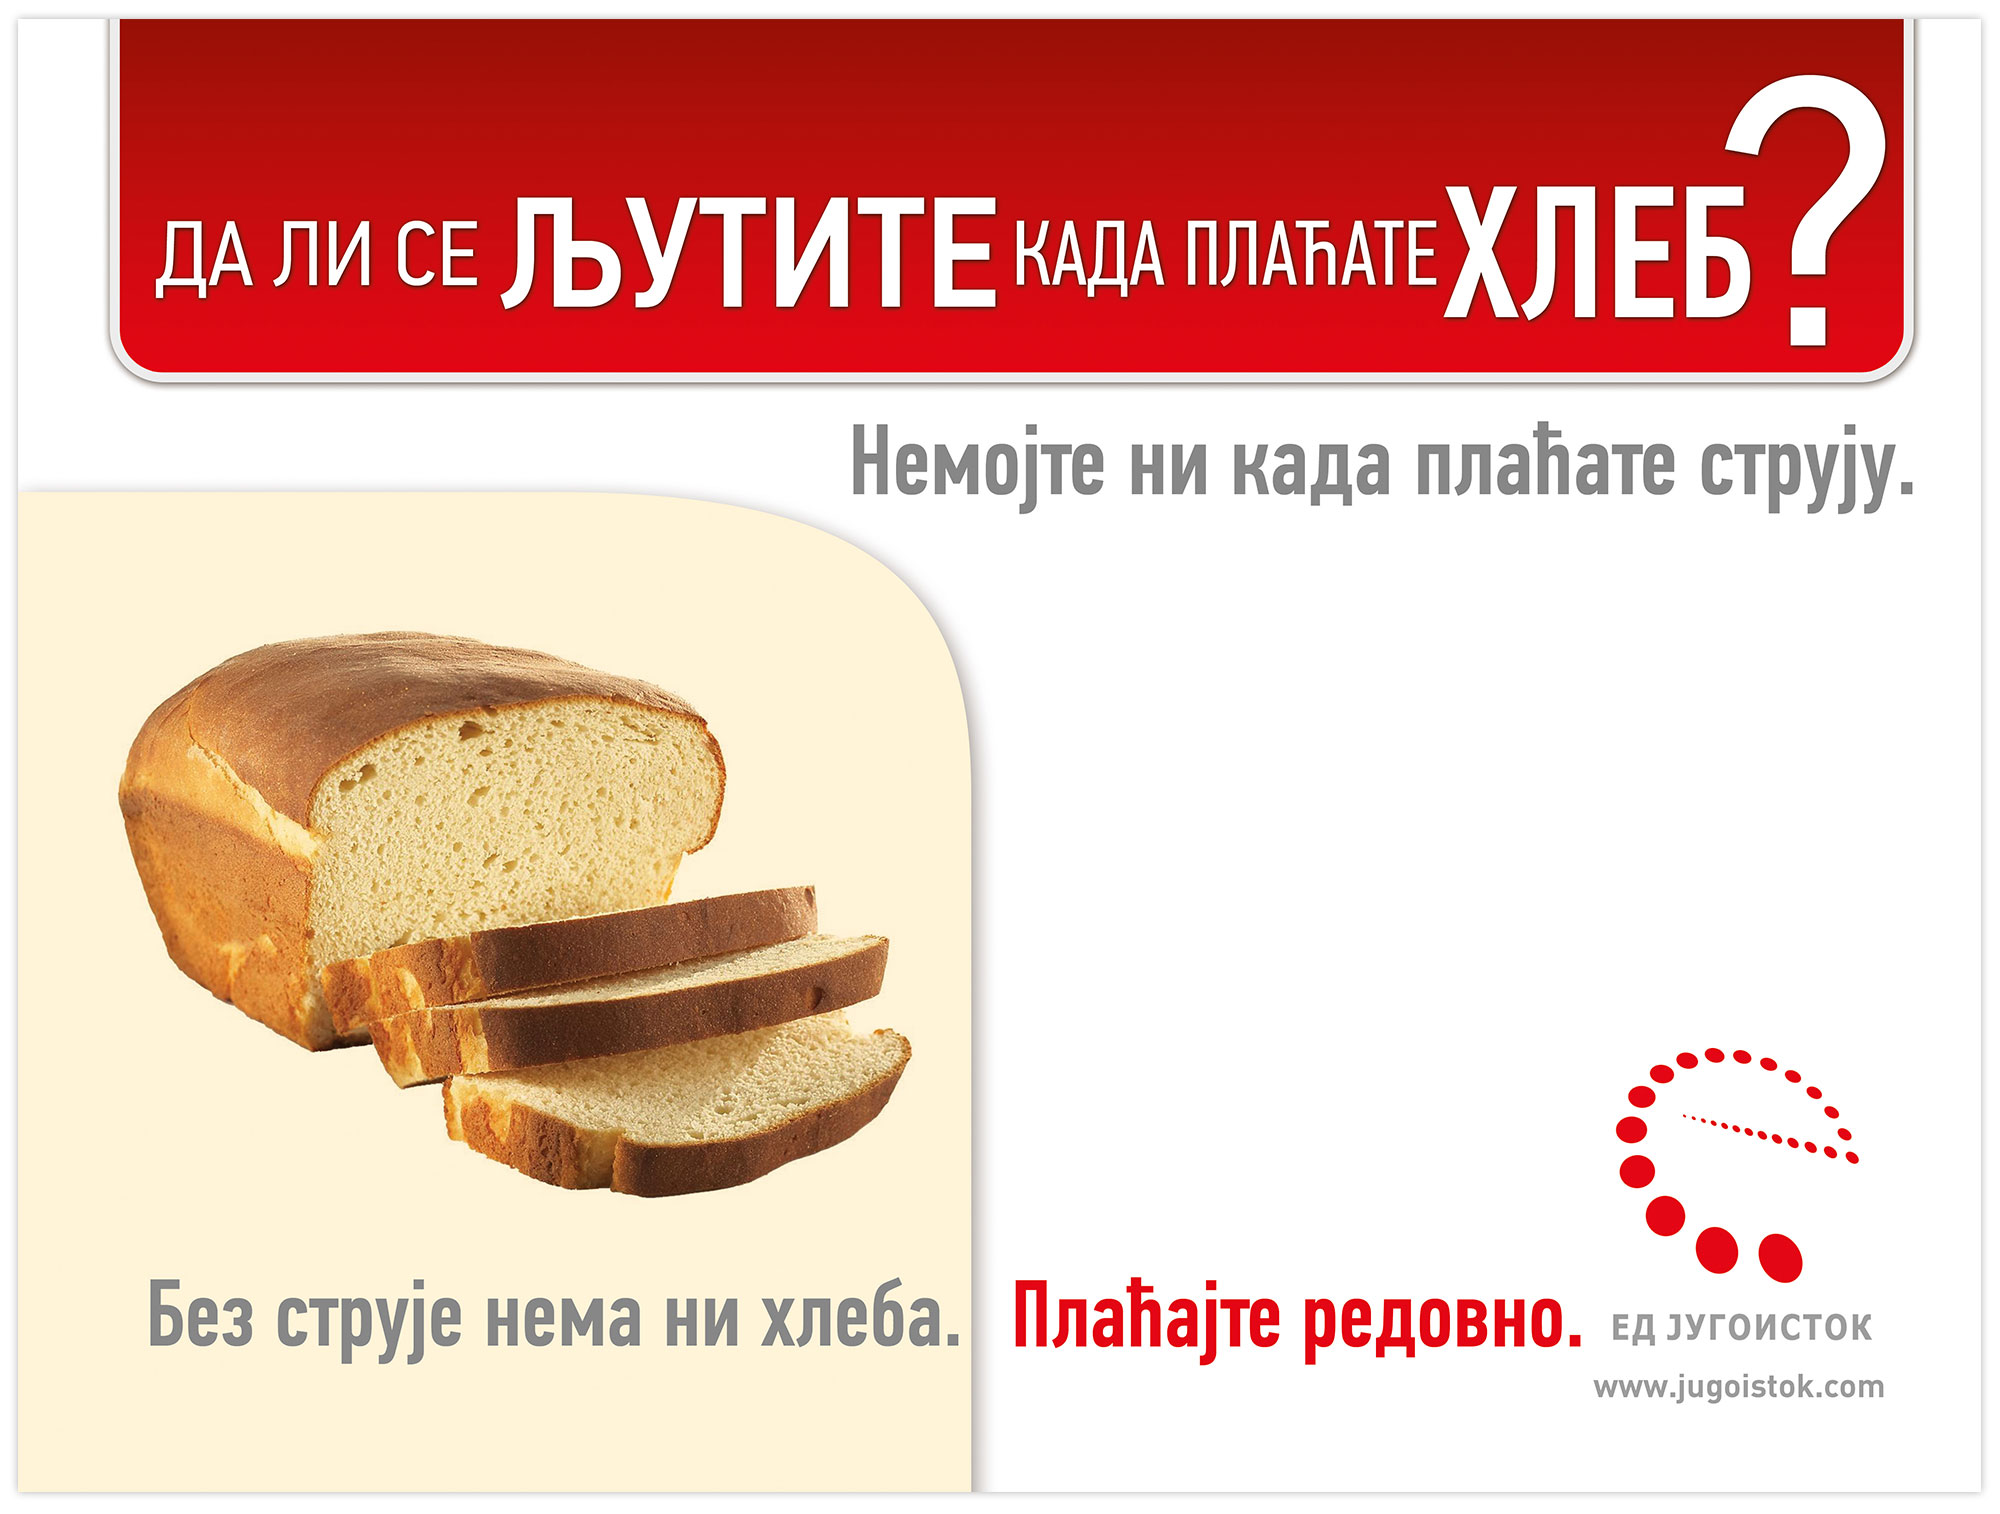 jugoistok poster 2